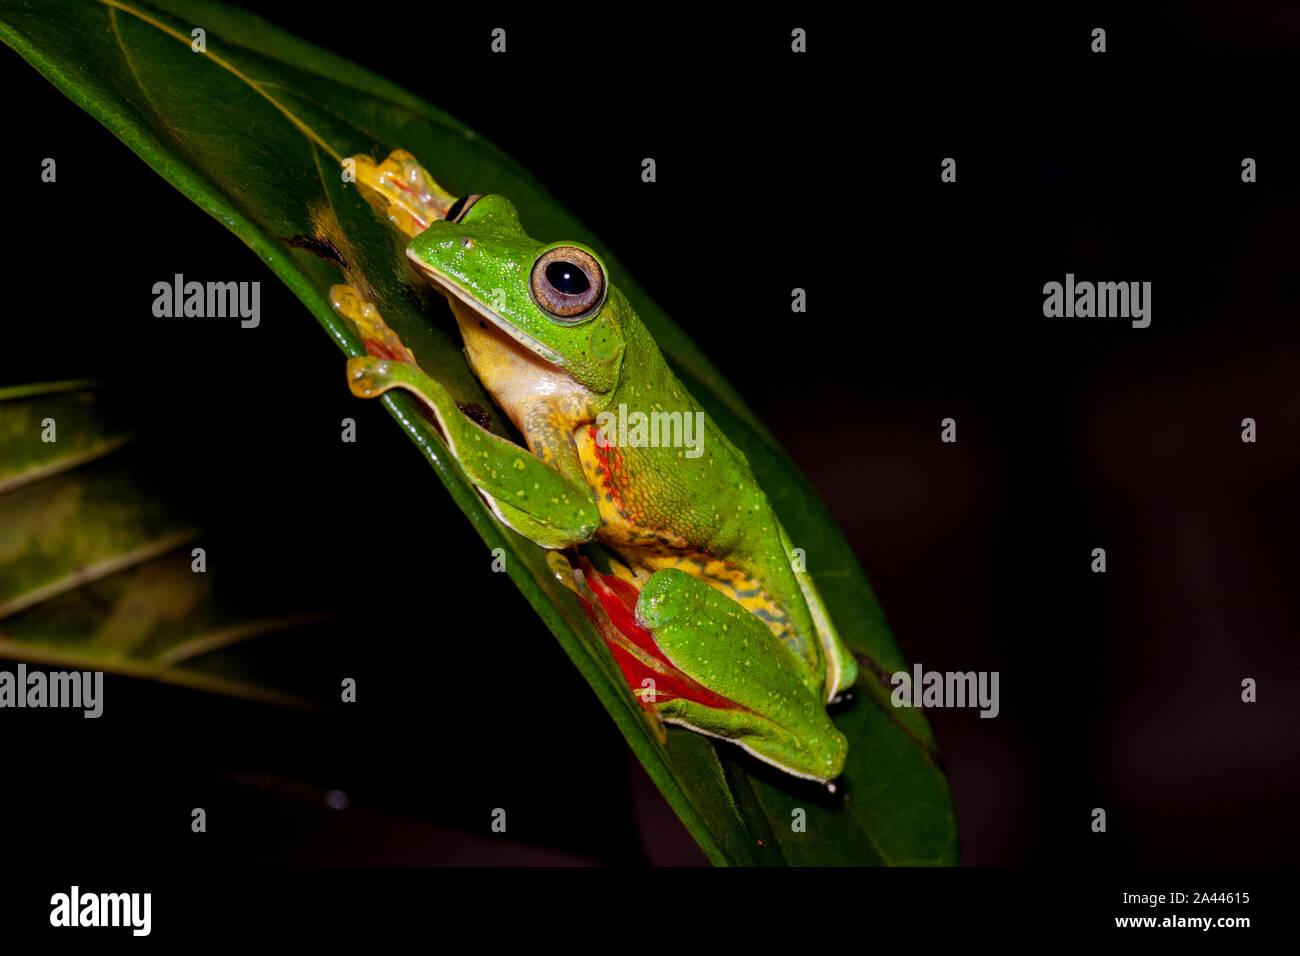 Rhacophorous Malabaricus o deslizamiento de Malabar Frog visto Amboli,Maharashtra, India Foto de stock